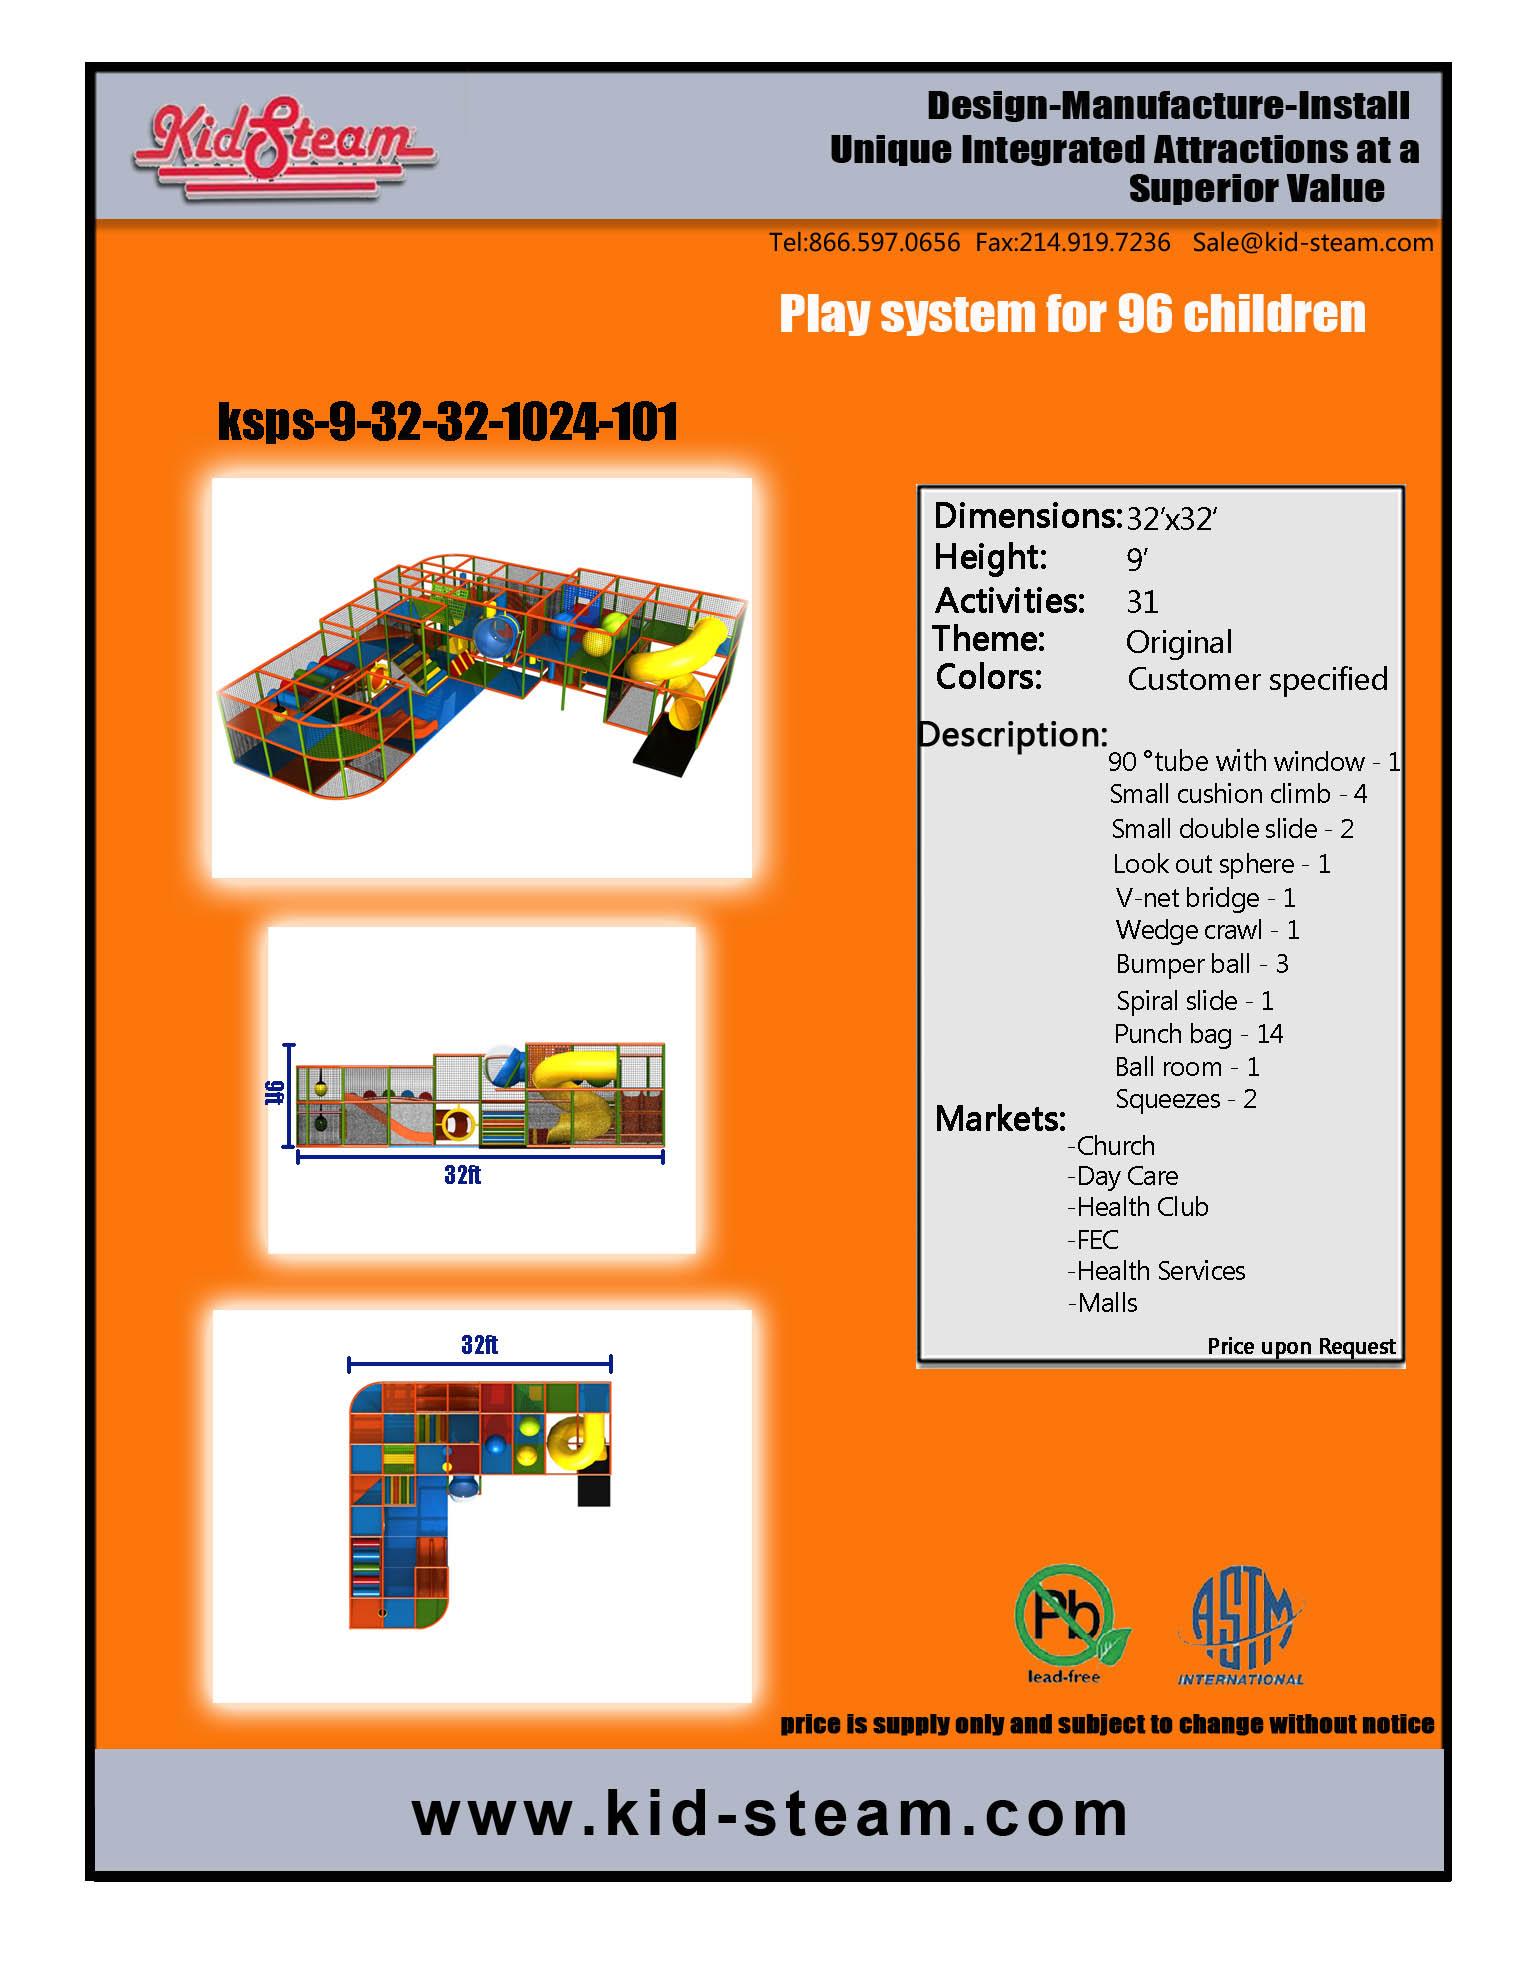 Indoor Playground Design: Budget: $29,000-$58,000 Ages: 3-12